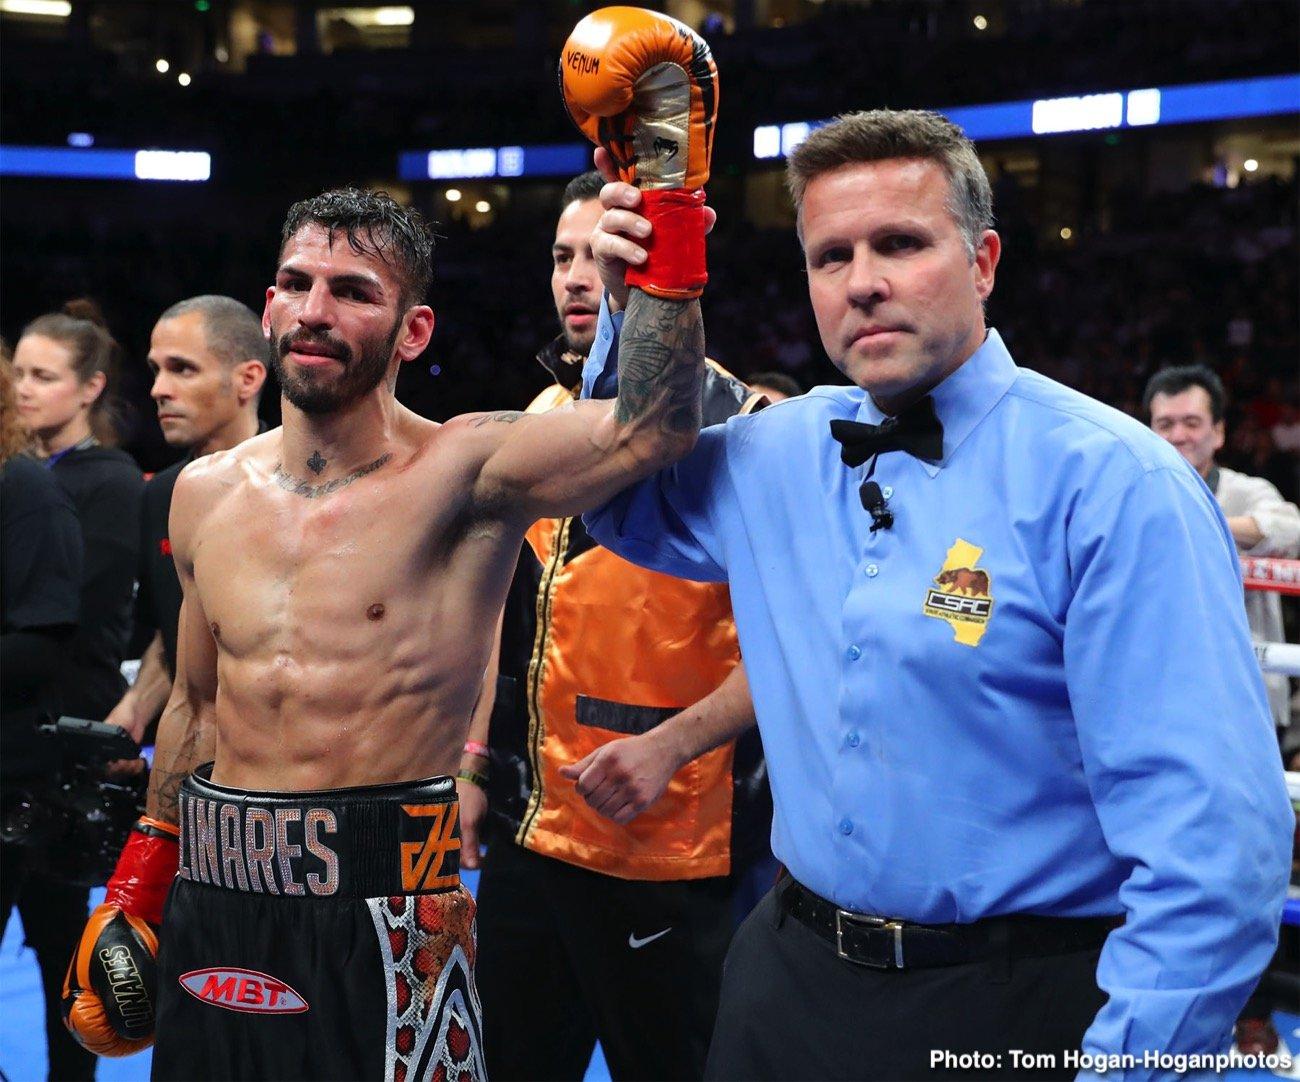 boxing-LinaresMorales_Hoganphotos1